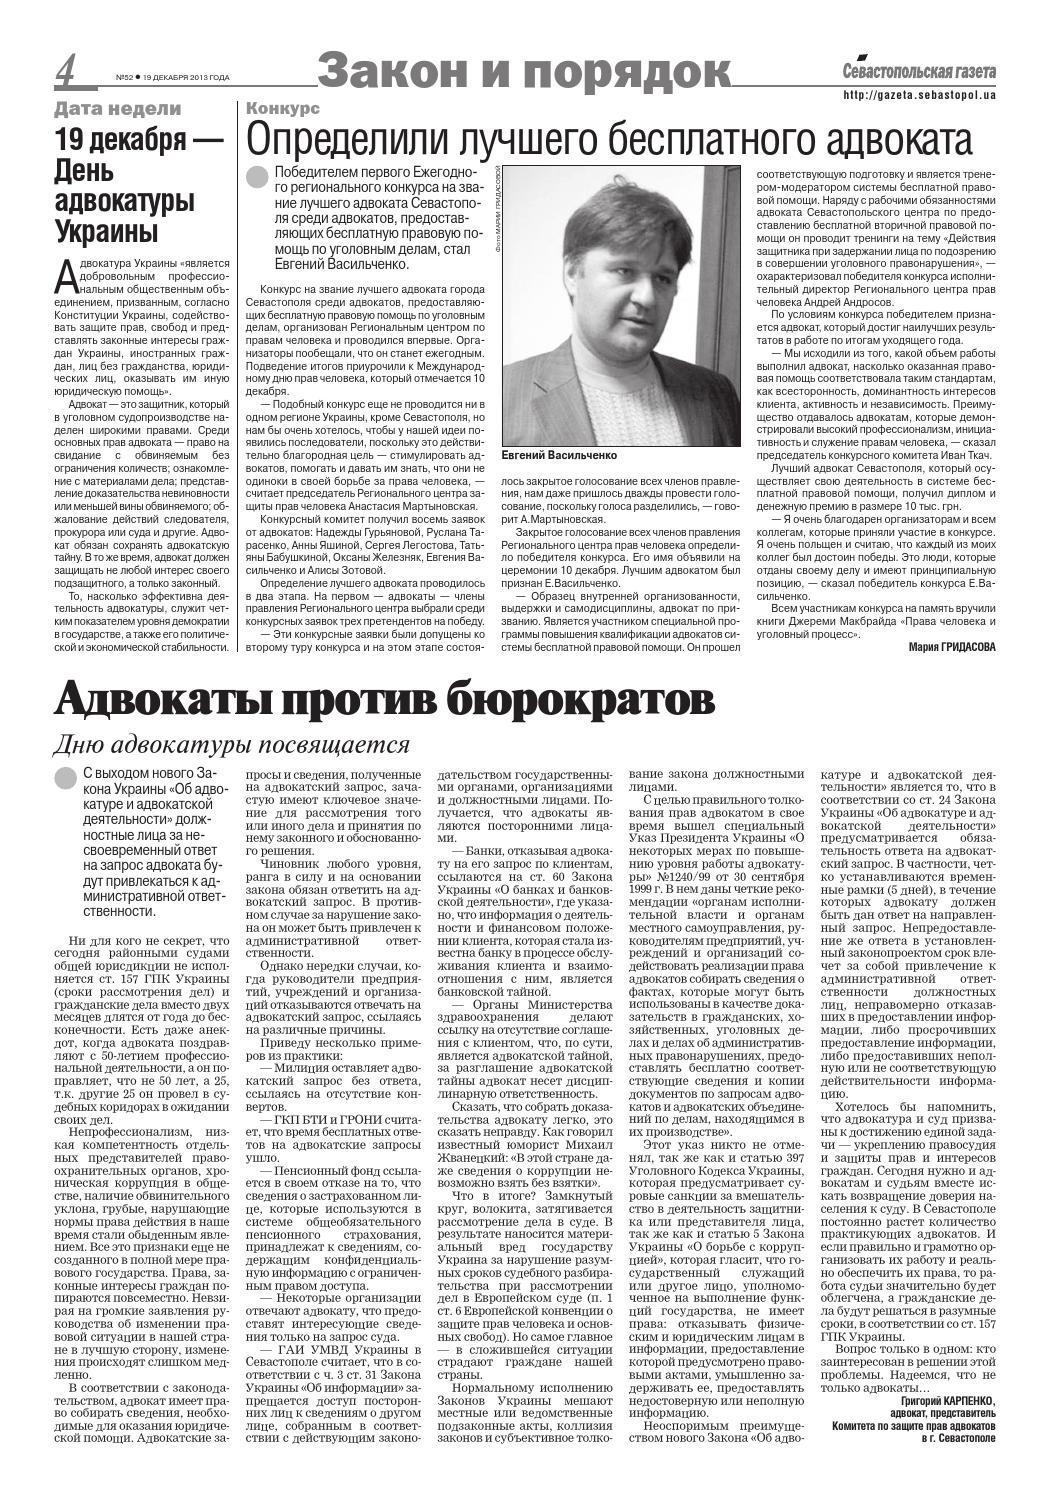 васильченко адвокат